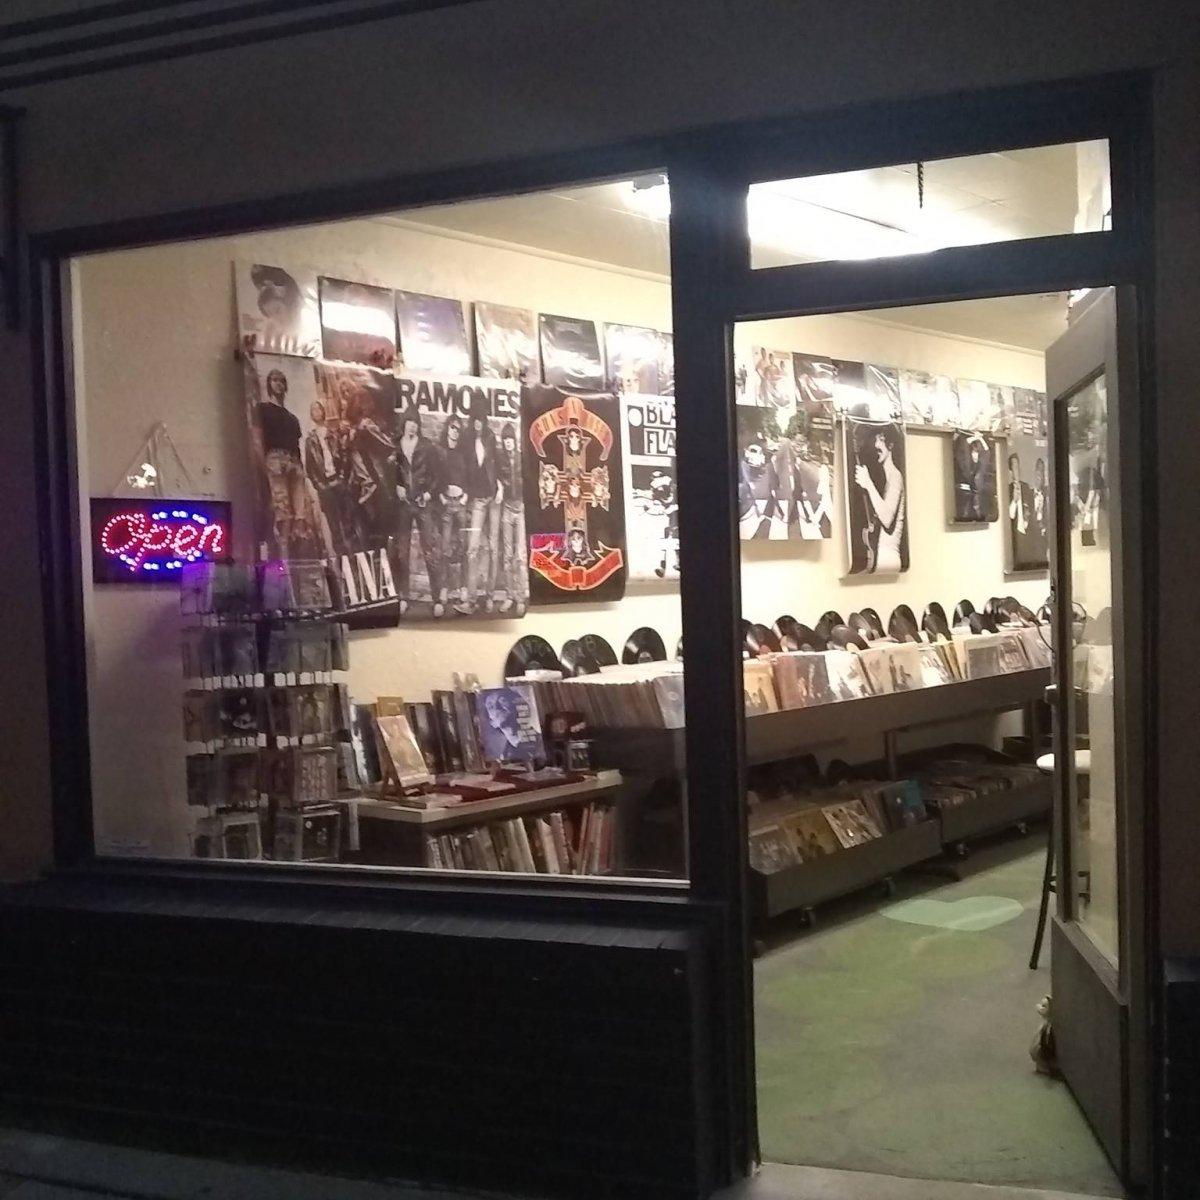 Krazy Katz Vintage Vinyl Records / Yuba City on recordstores love